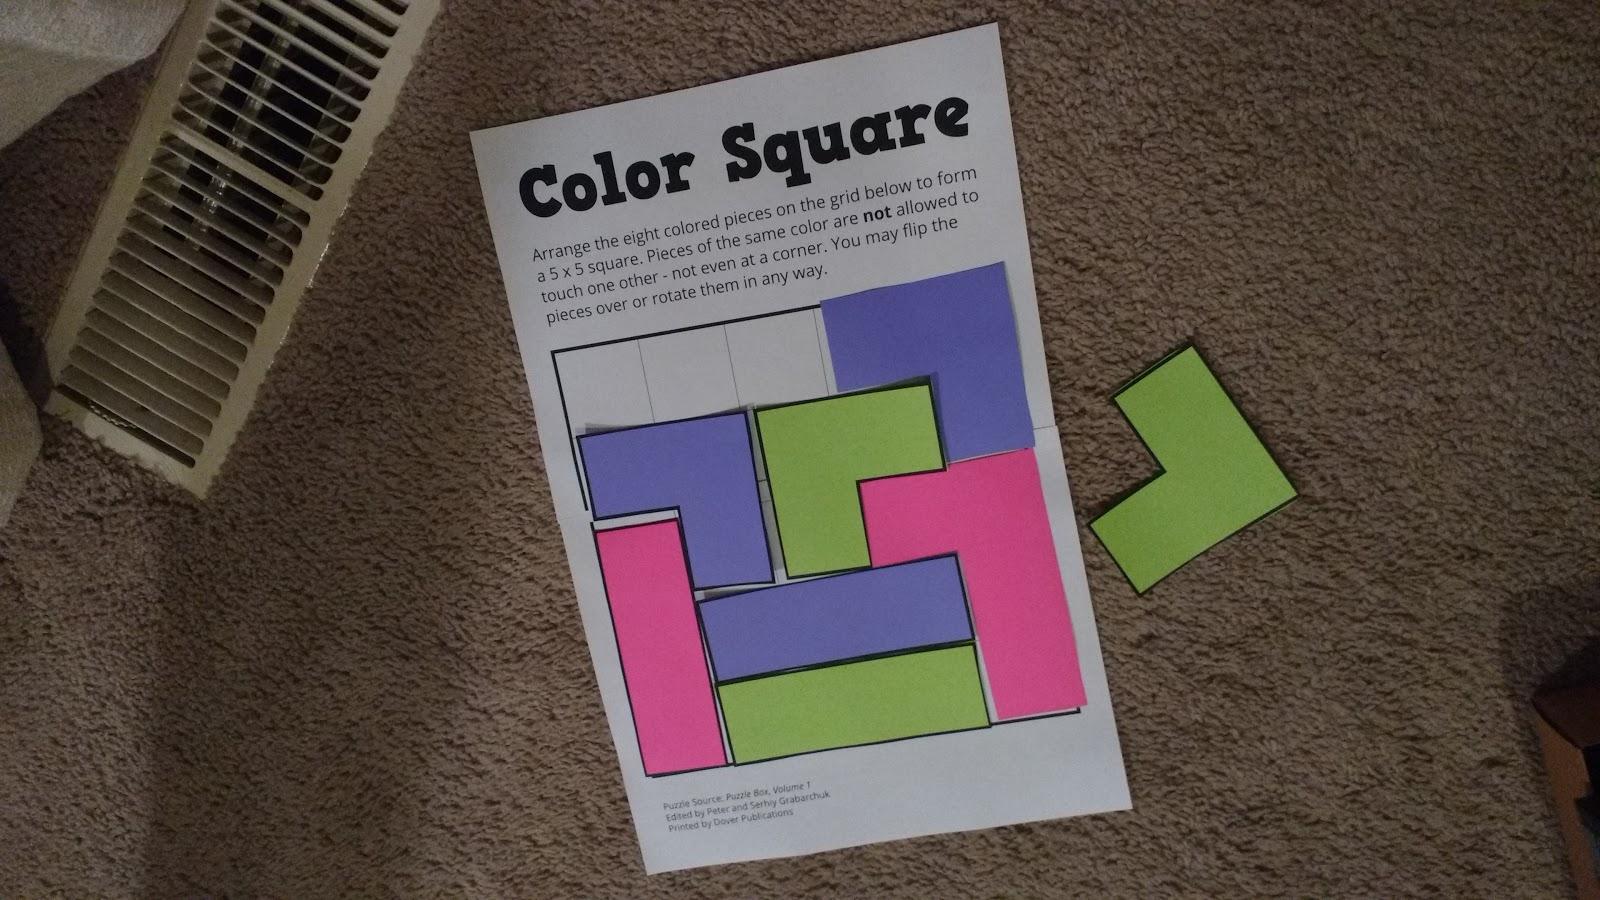 Math Love Color Square Puzzle From Puzzle Box Volume 1